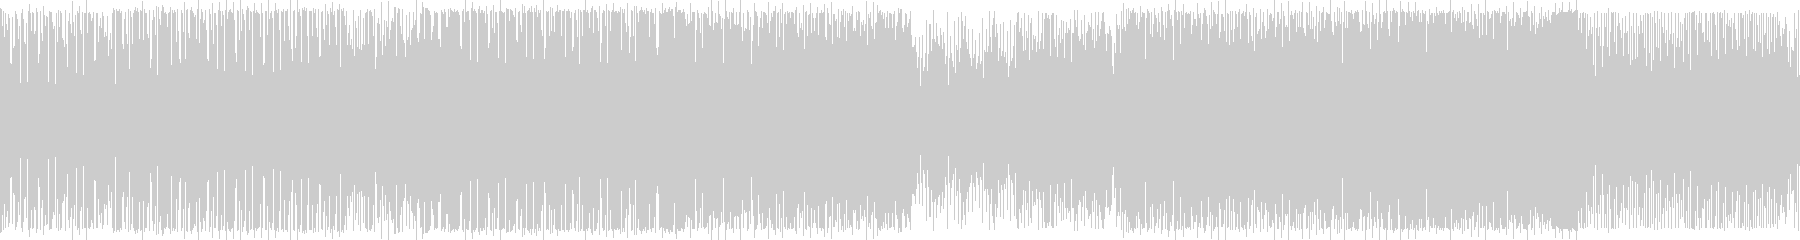 BPM140:ワークアウト:ループ版の未再生の波形